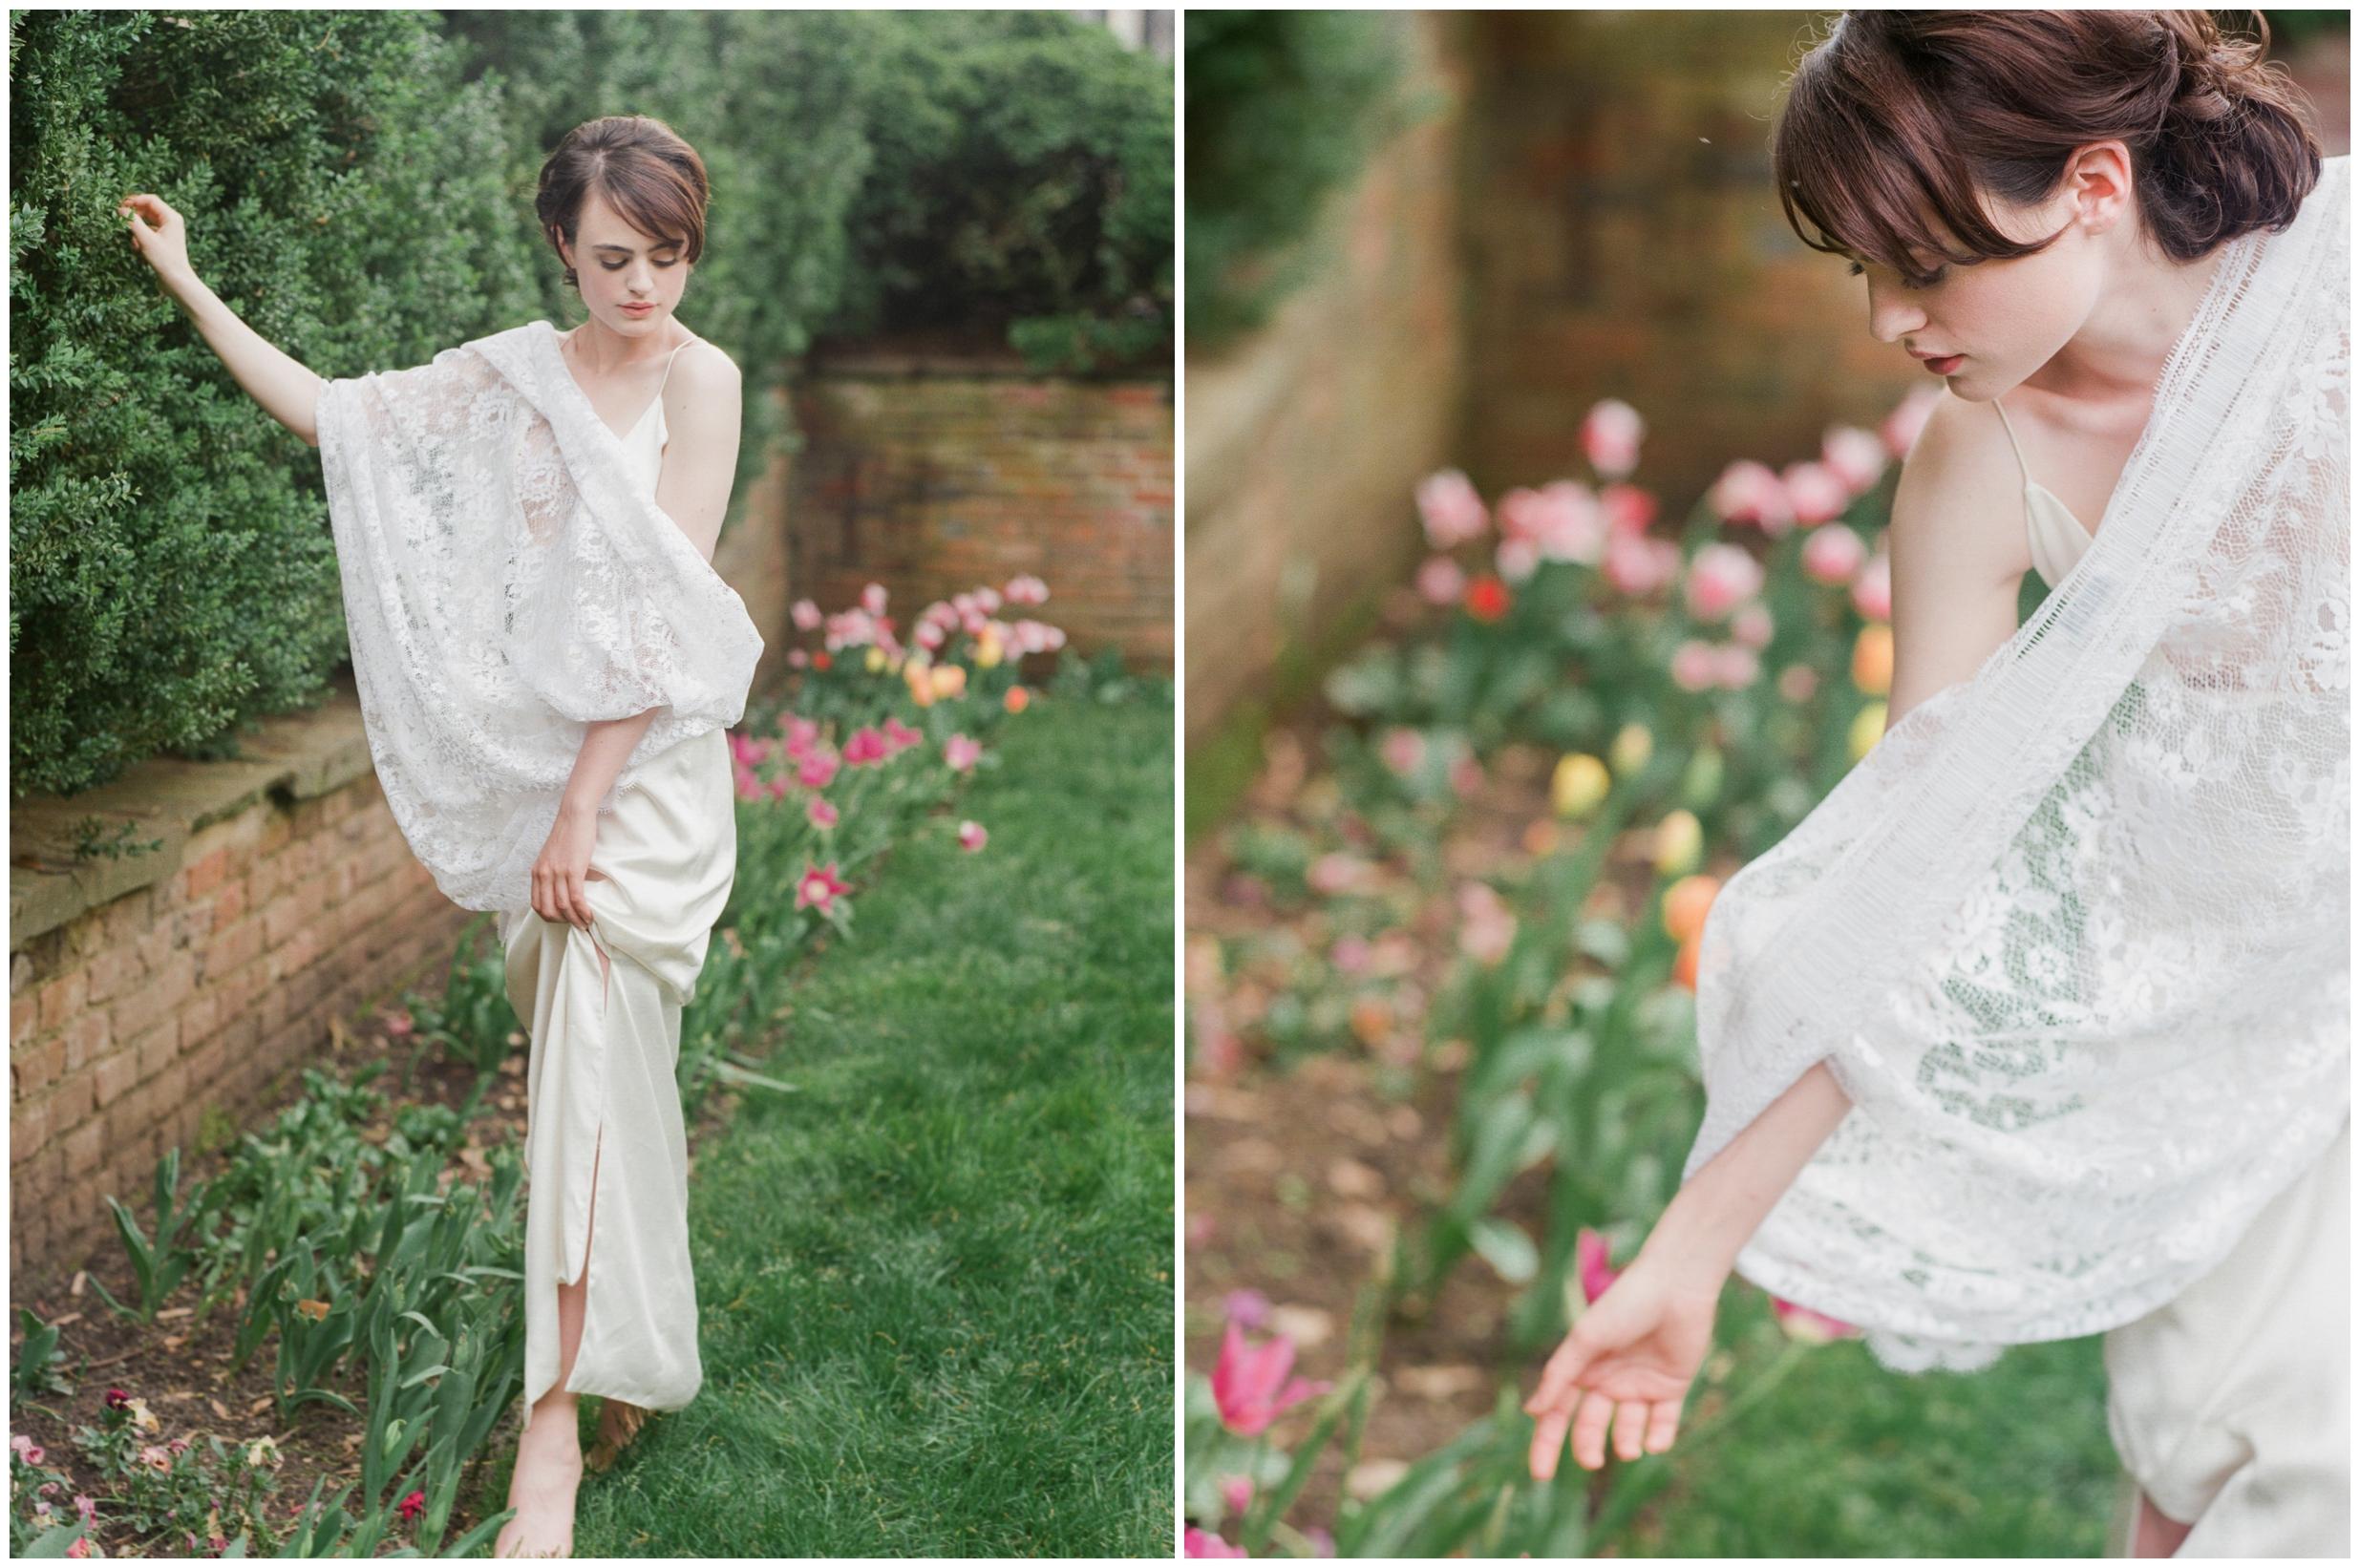 outdoor fine art boudoir photographer lissa ryan photography washington DC maryland virginia